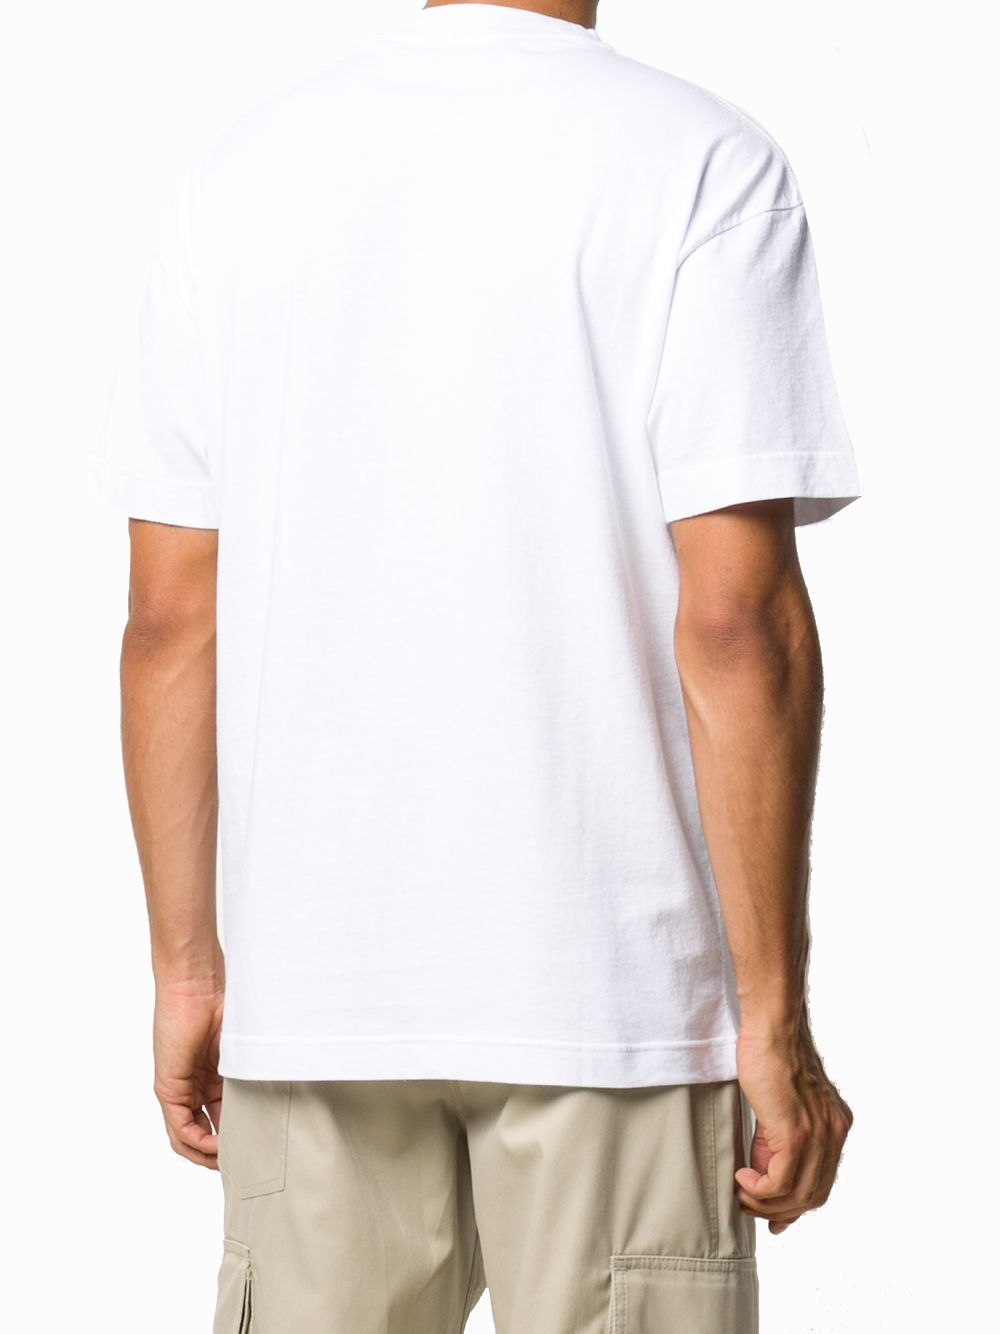 PALM ANGELS T-shirts PALM ANGELS MEN'S WHITE COTTON T-SHIRT